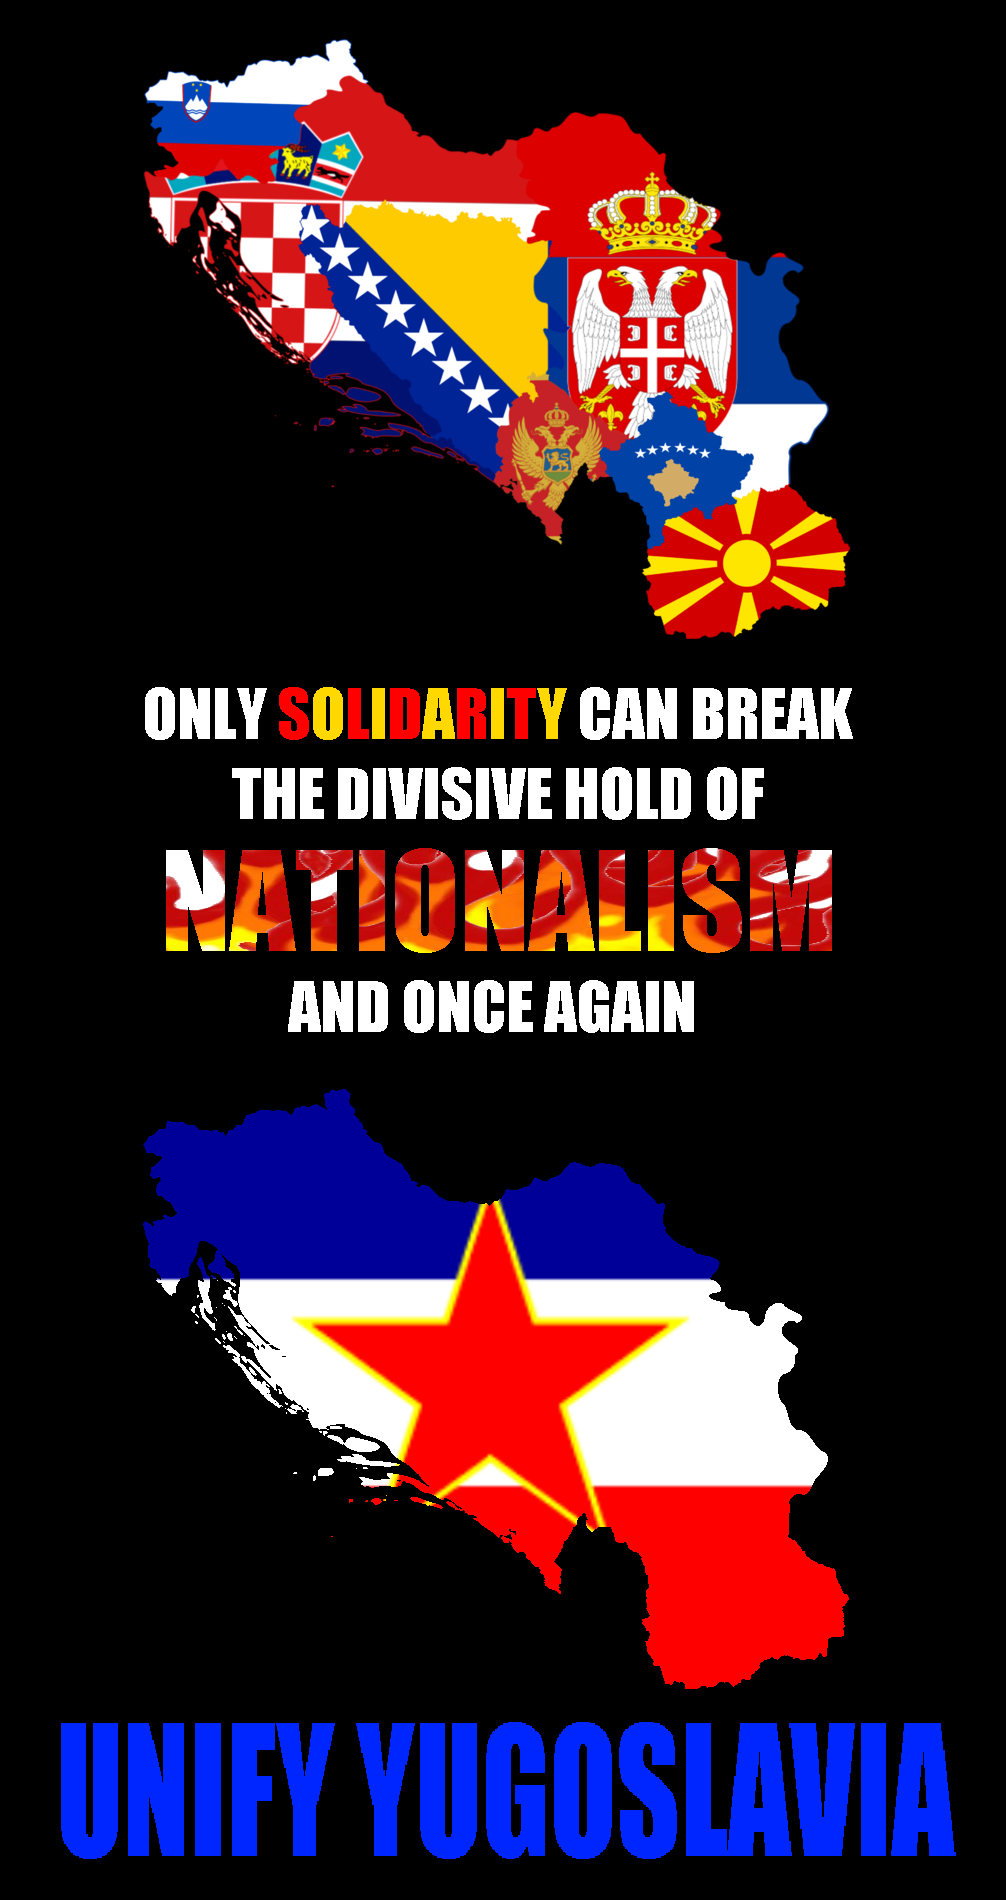 Unify Yugoslavia by Atamolos